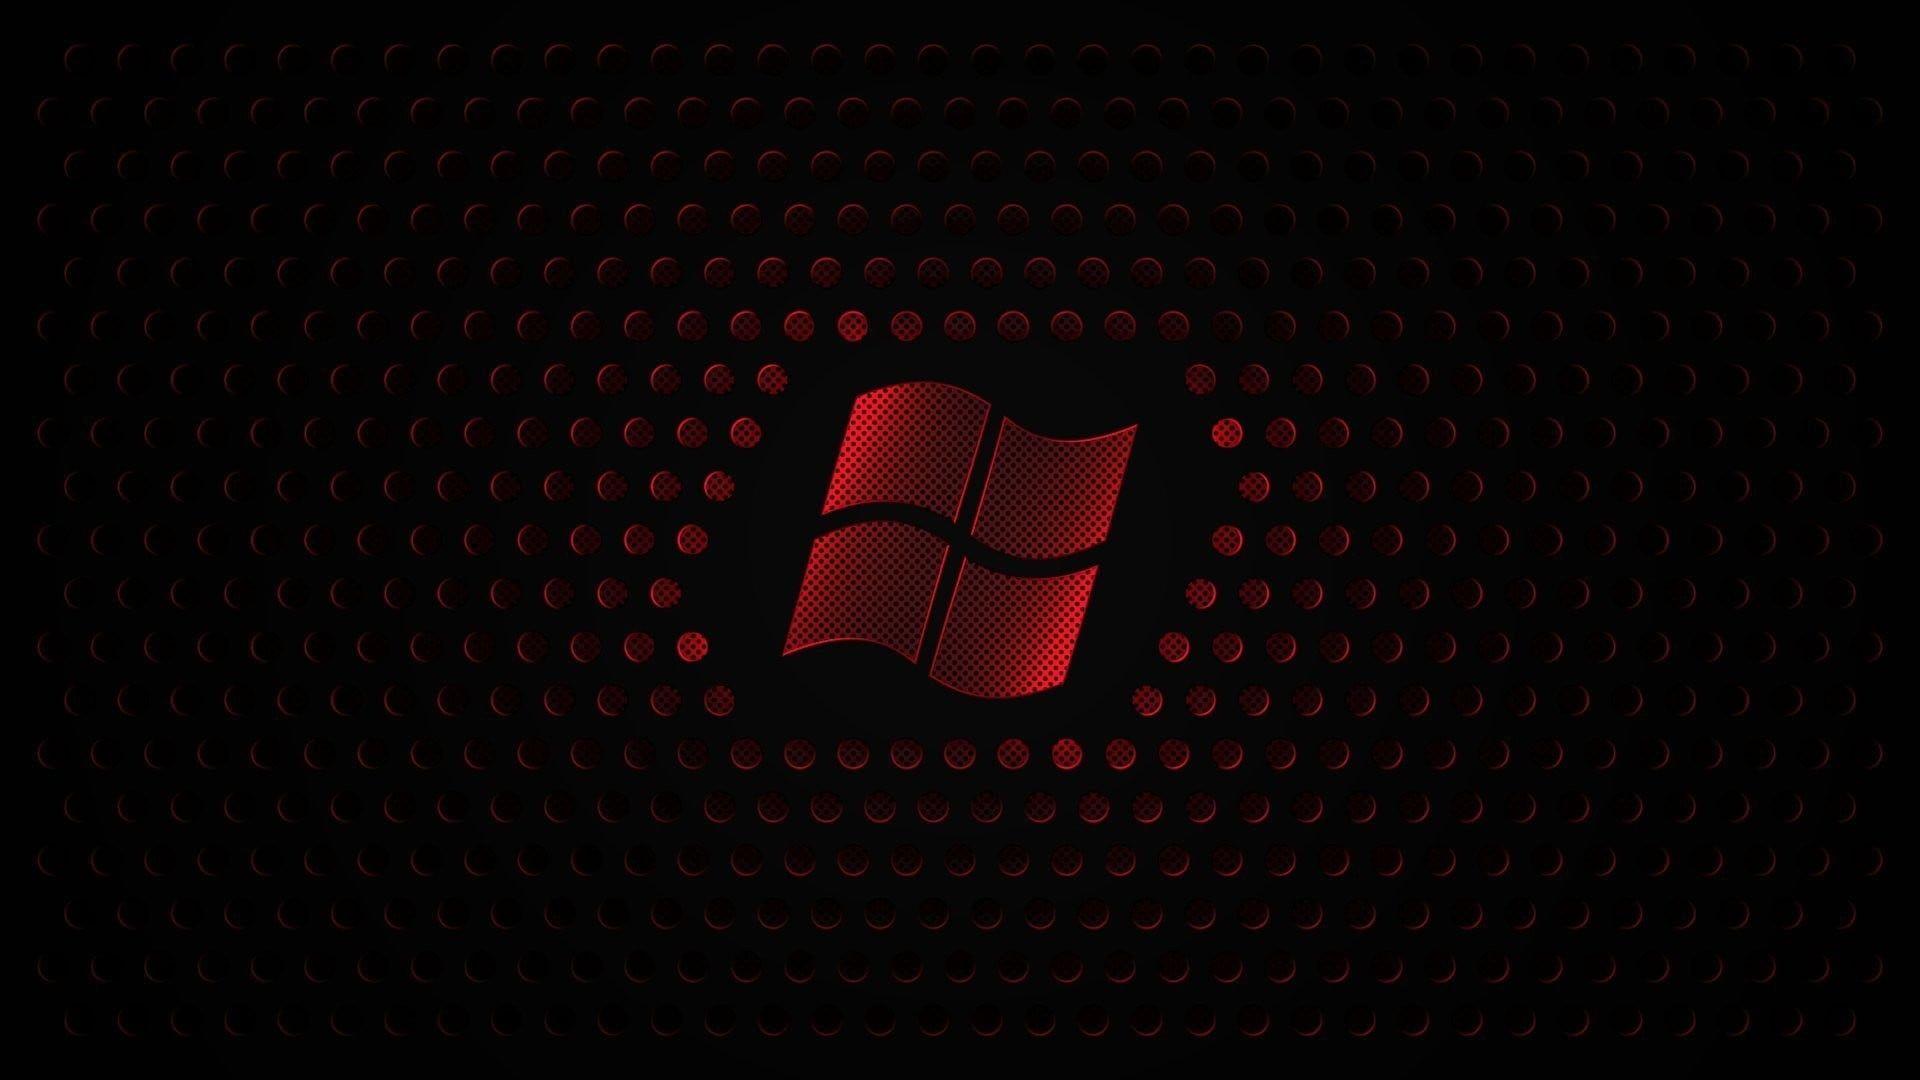 Windows Logo Illustration Microsoft Windows Windows 7 Black Red 1080p Wallpaper Hdwallpaper Deskt Snowman Wallpaper Red And Black Wallpaper Red Wallpaper